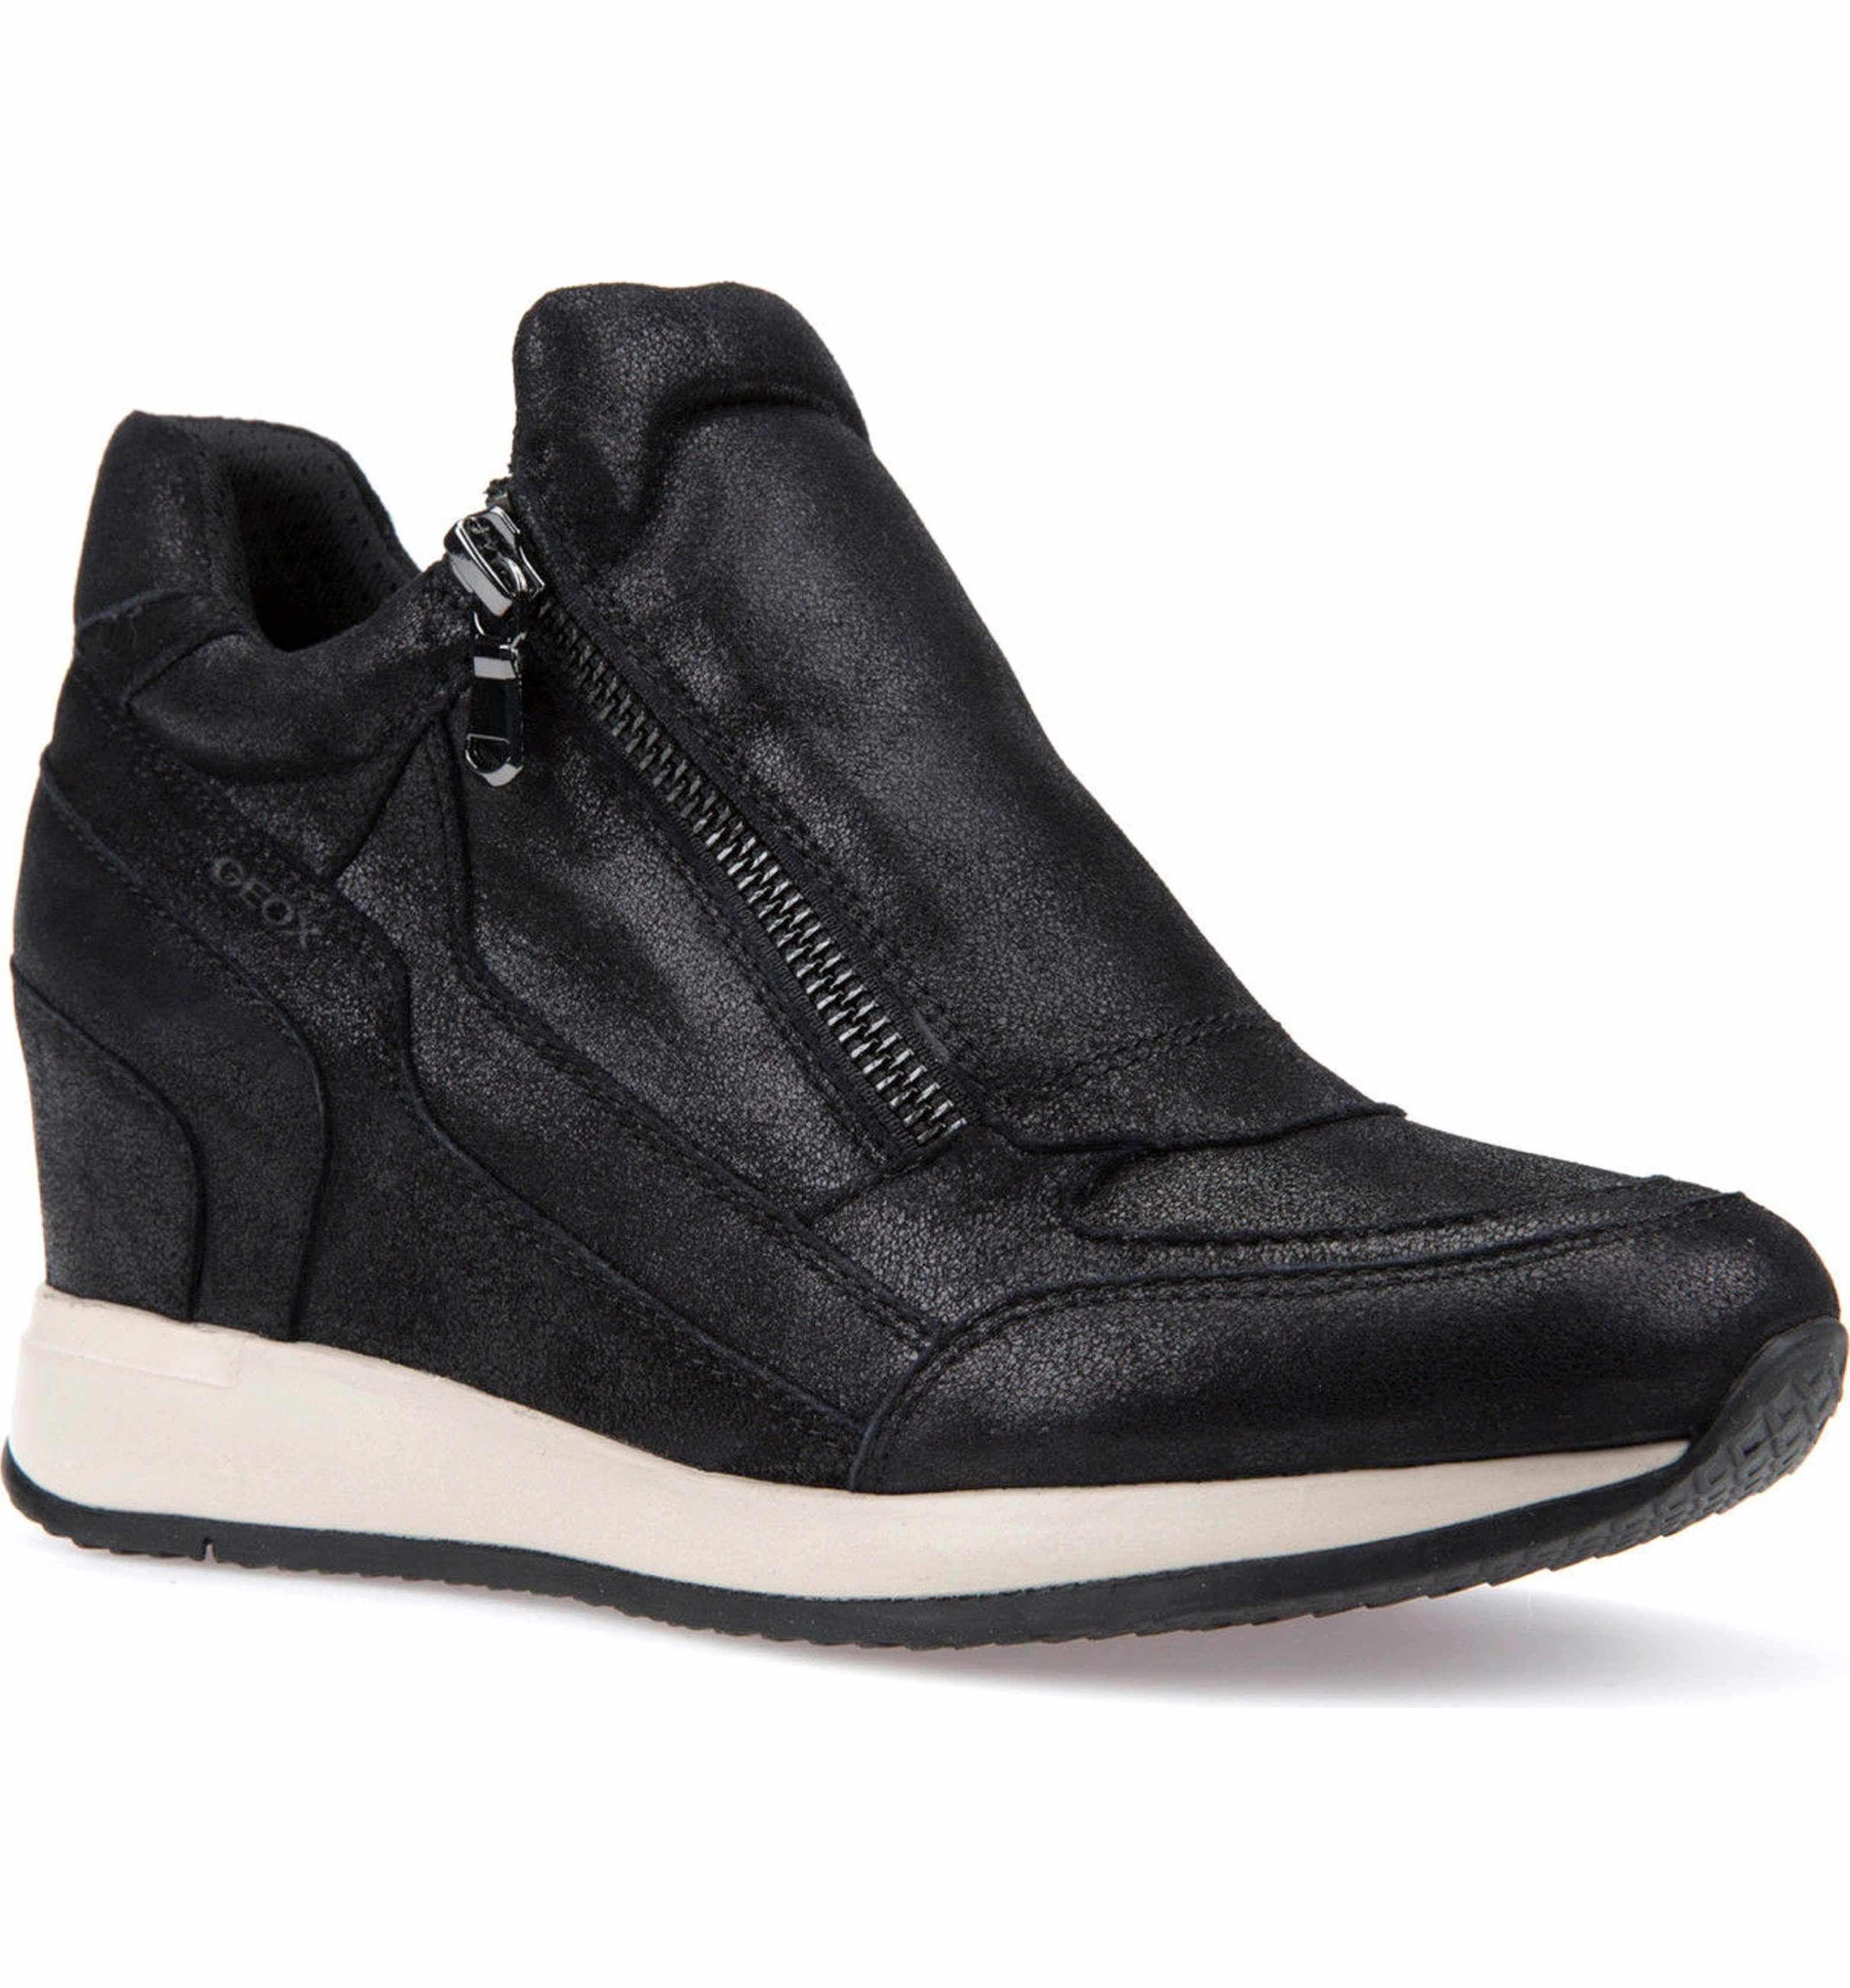 Geox Nydame Wedge Sneaker (Women